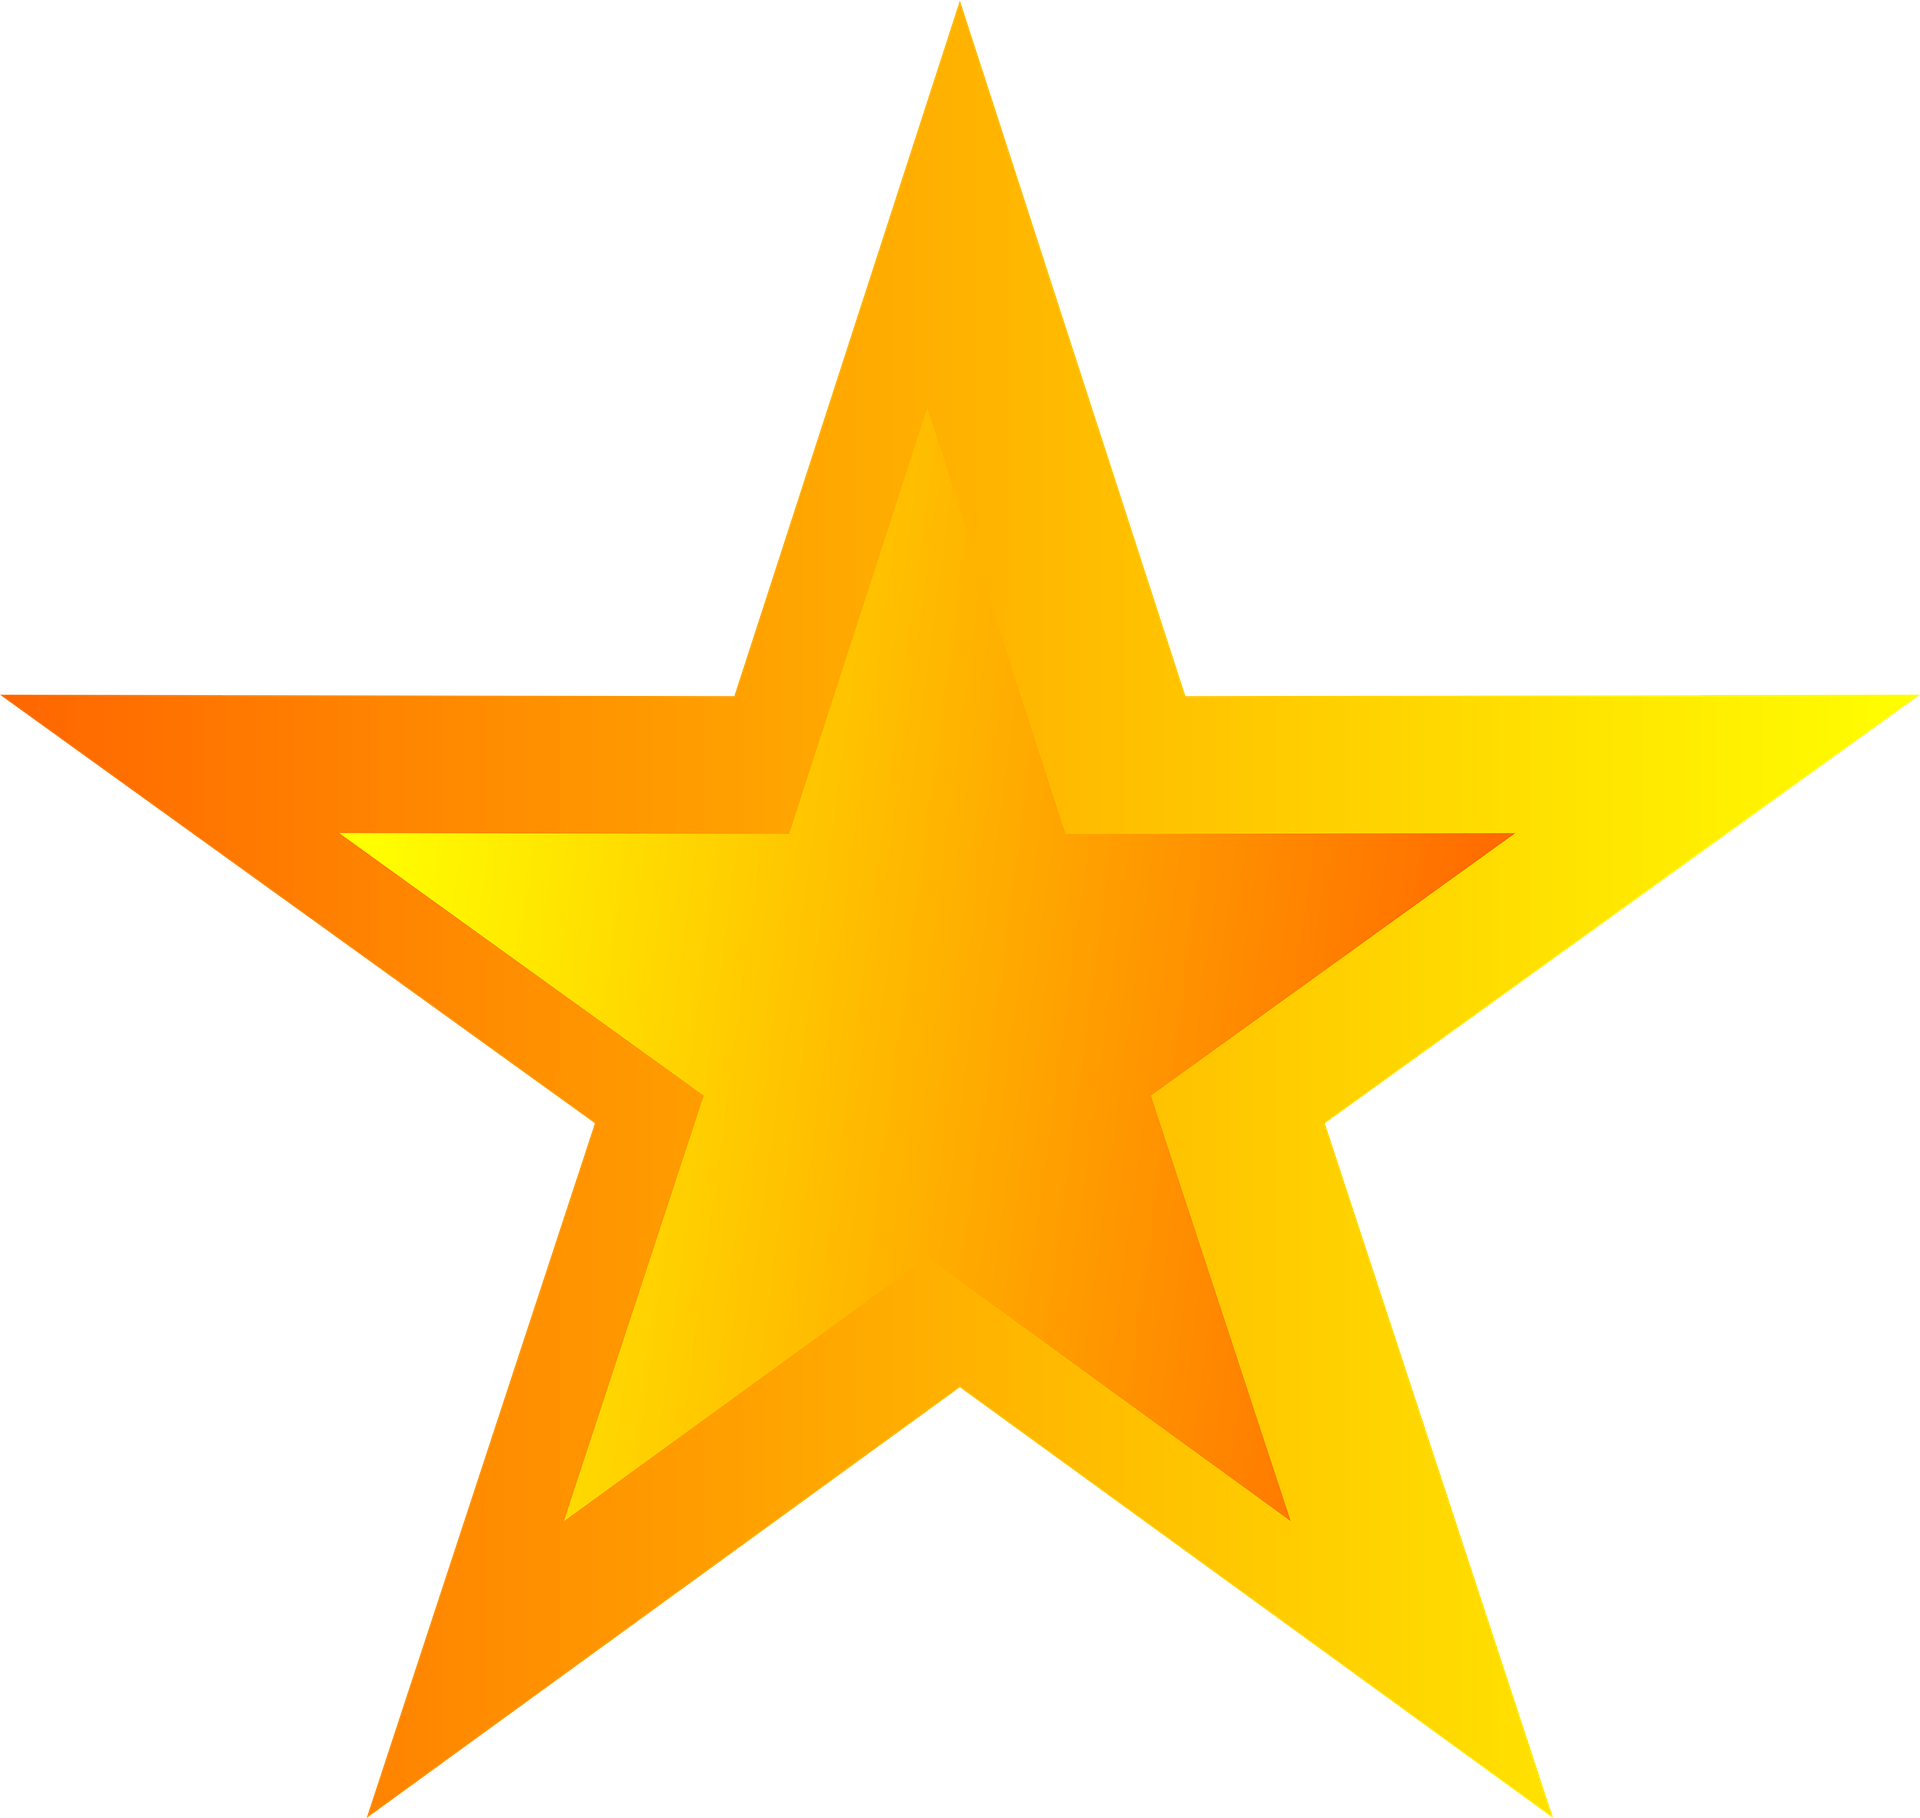 star-1586412_1920